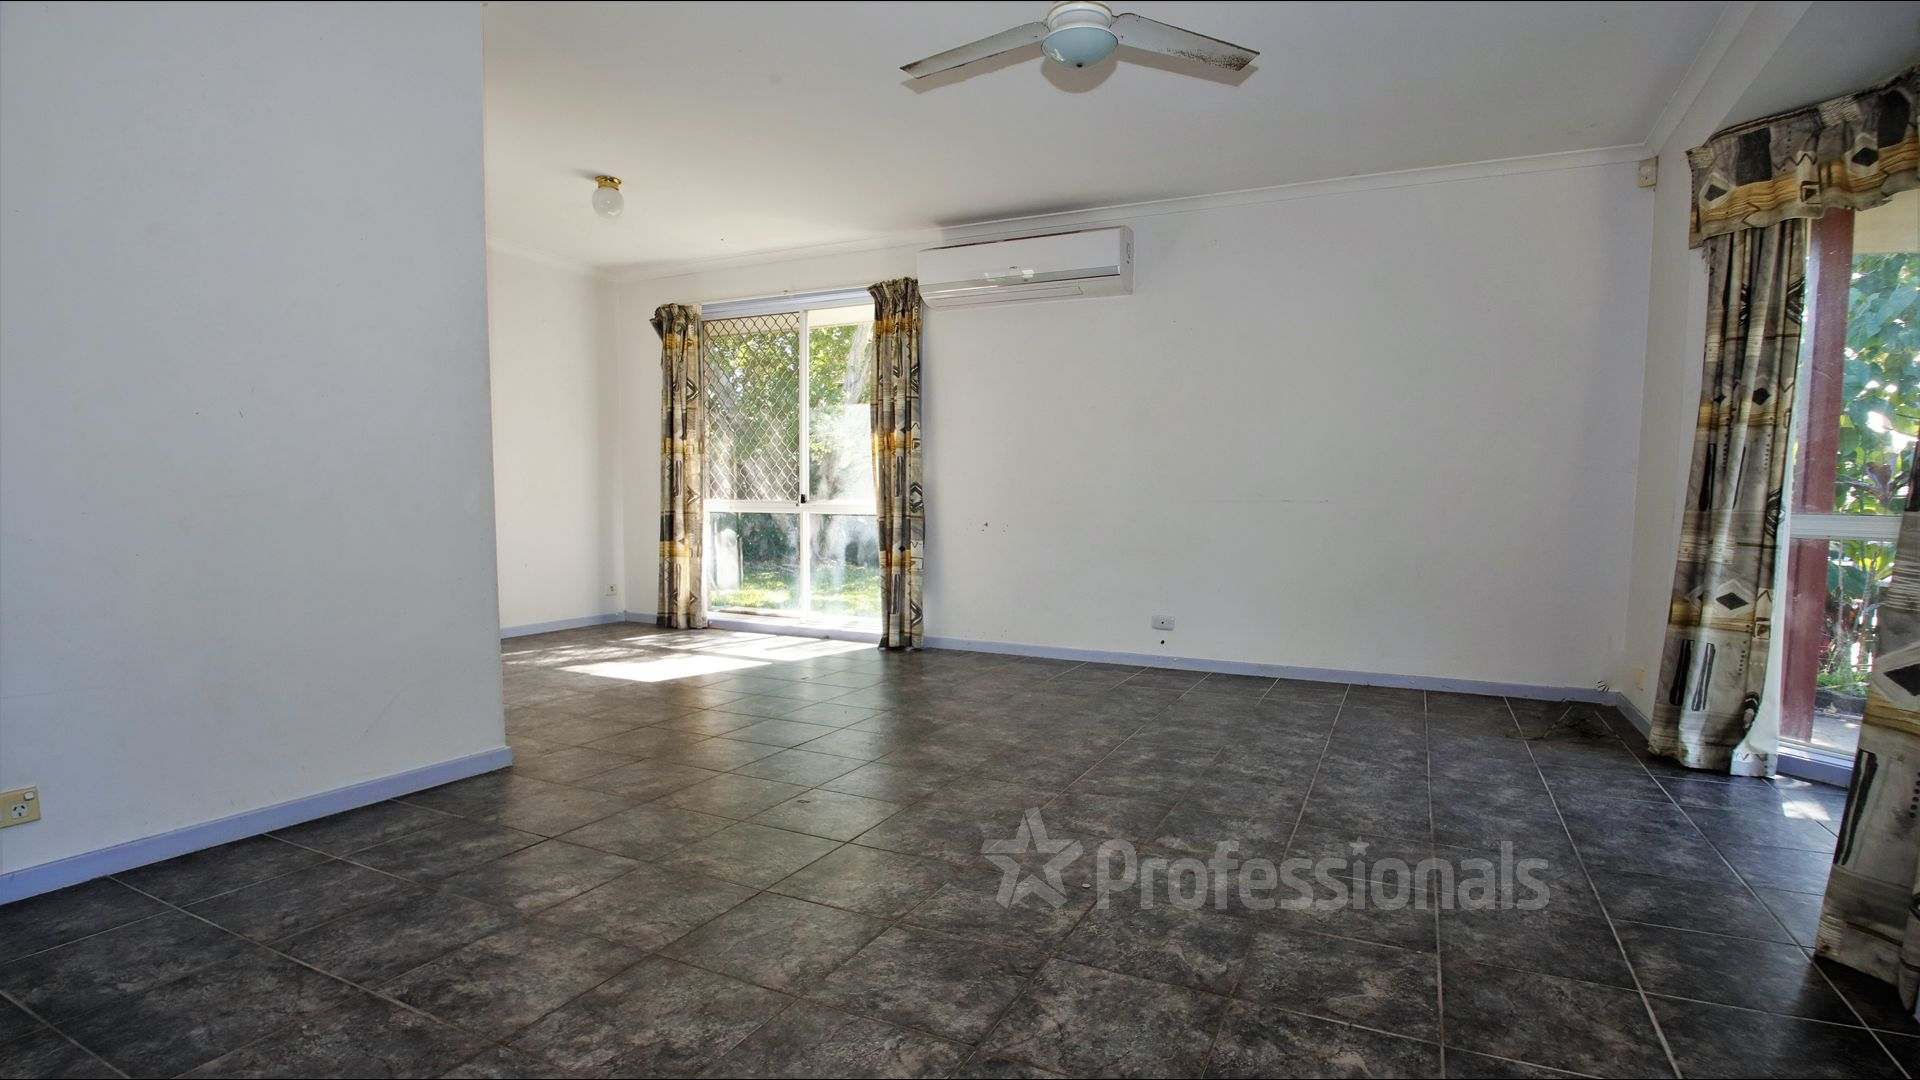 17 Ryan Street, Loganlea QLD 4131, Image 1